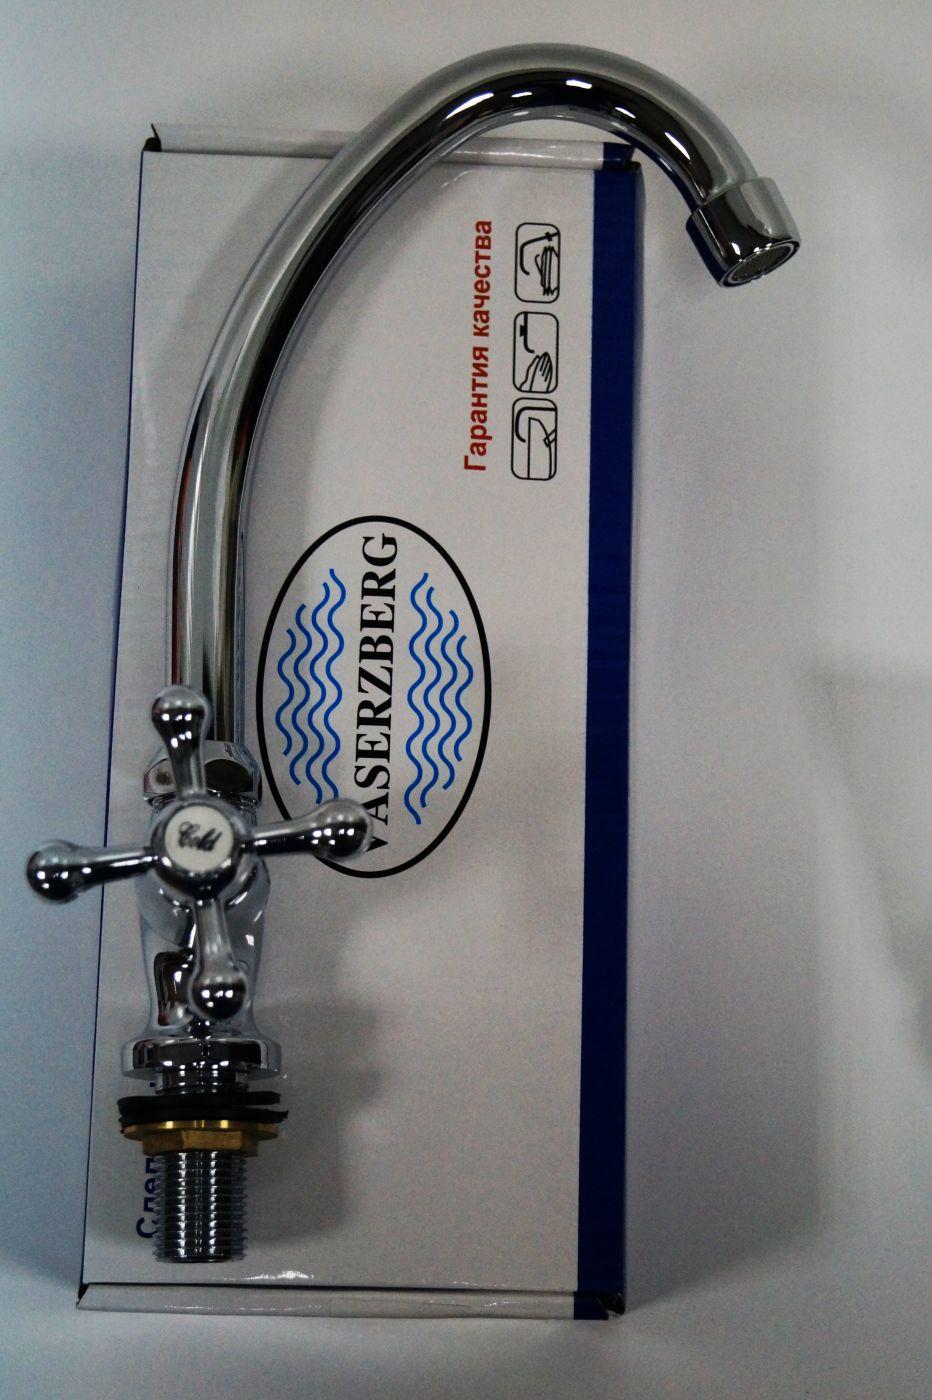 Vaserzberg Латунный одинарный кран, АА-8002